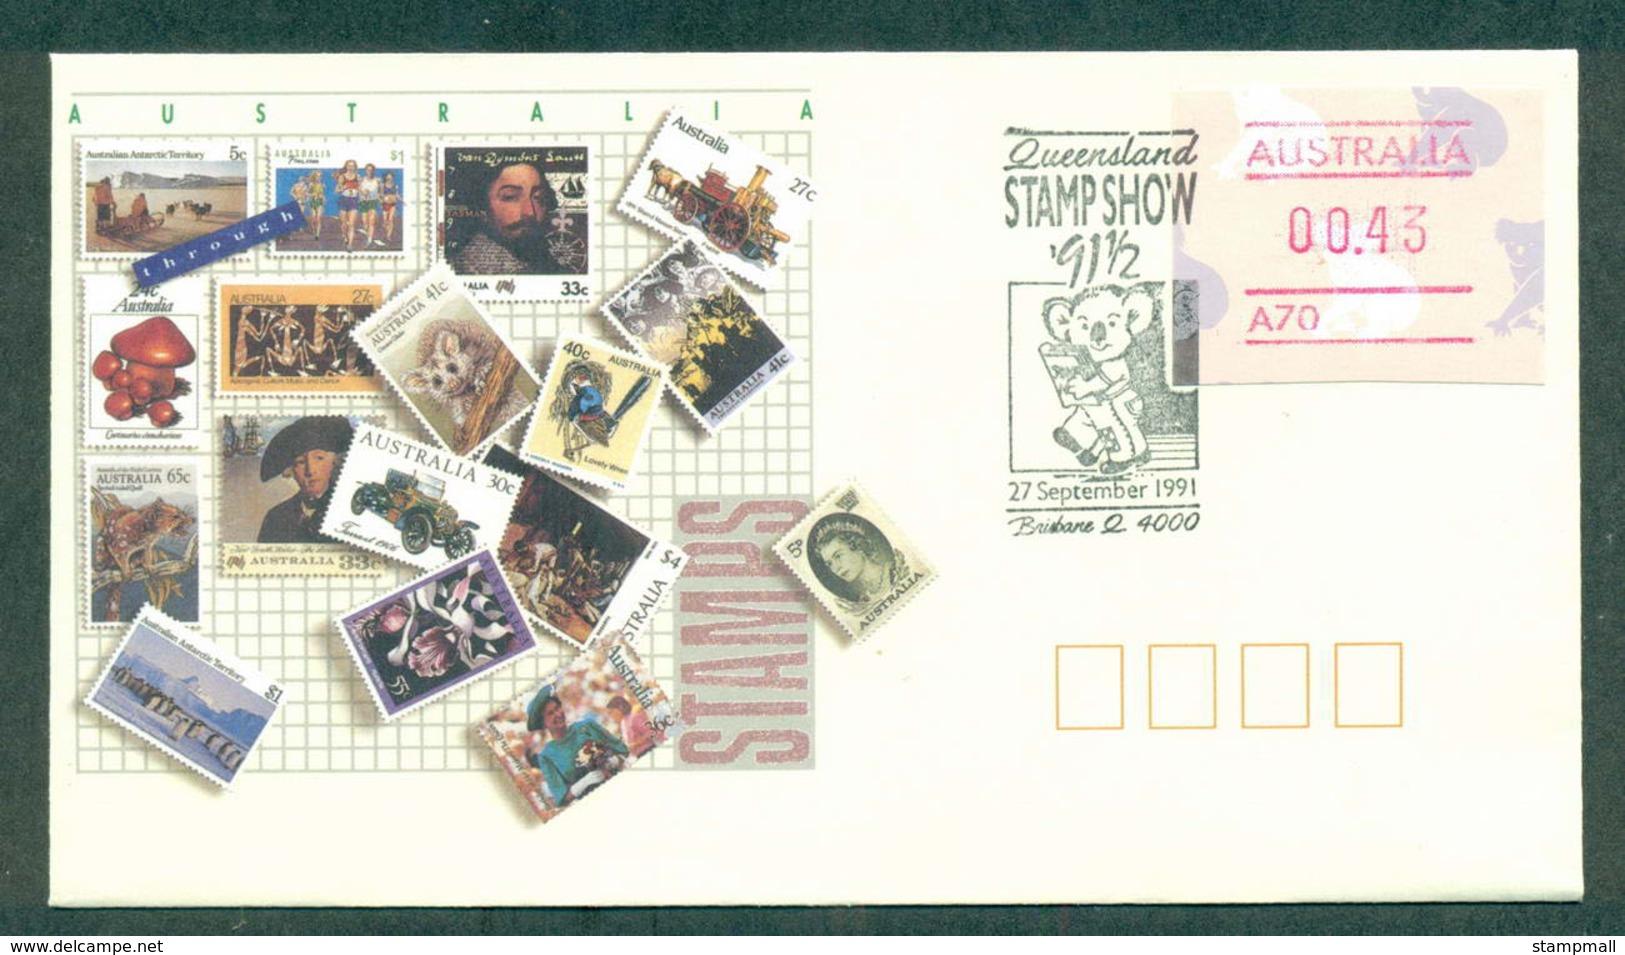 Australia 1991 Queensland Stamp Show 91? FDC Lot52378 - 1990-99 Elizabeth II